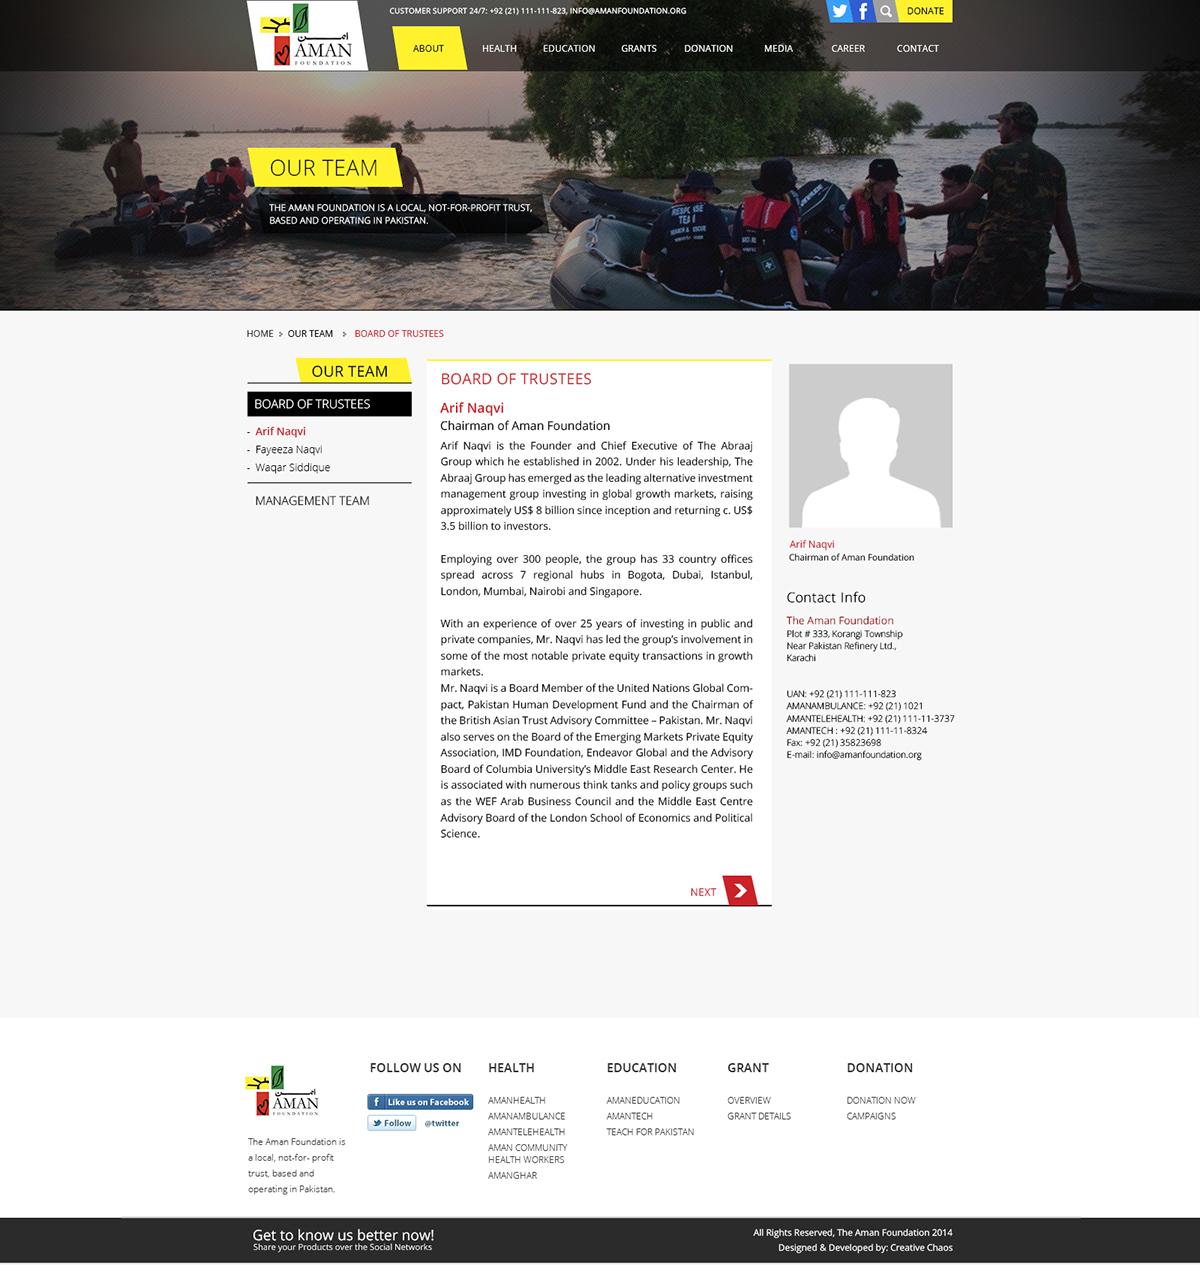 Aman Foundation Website Design on Behance